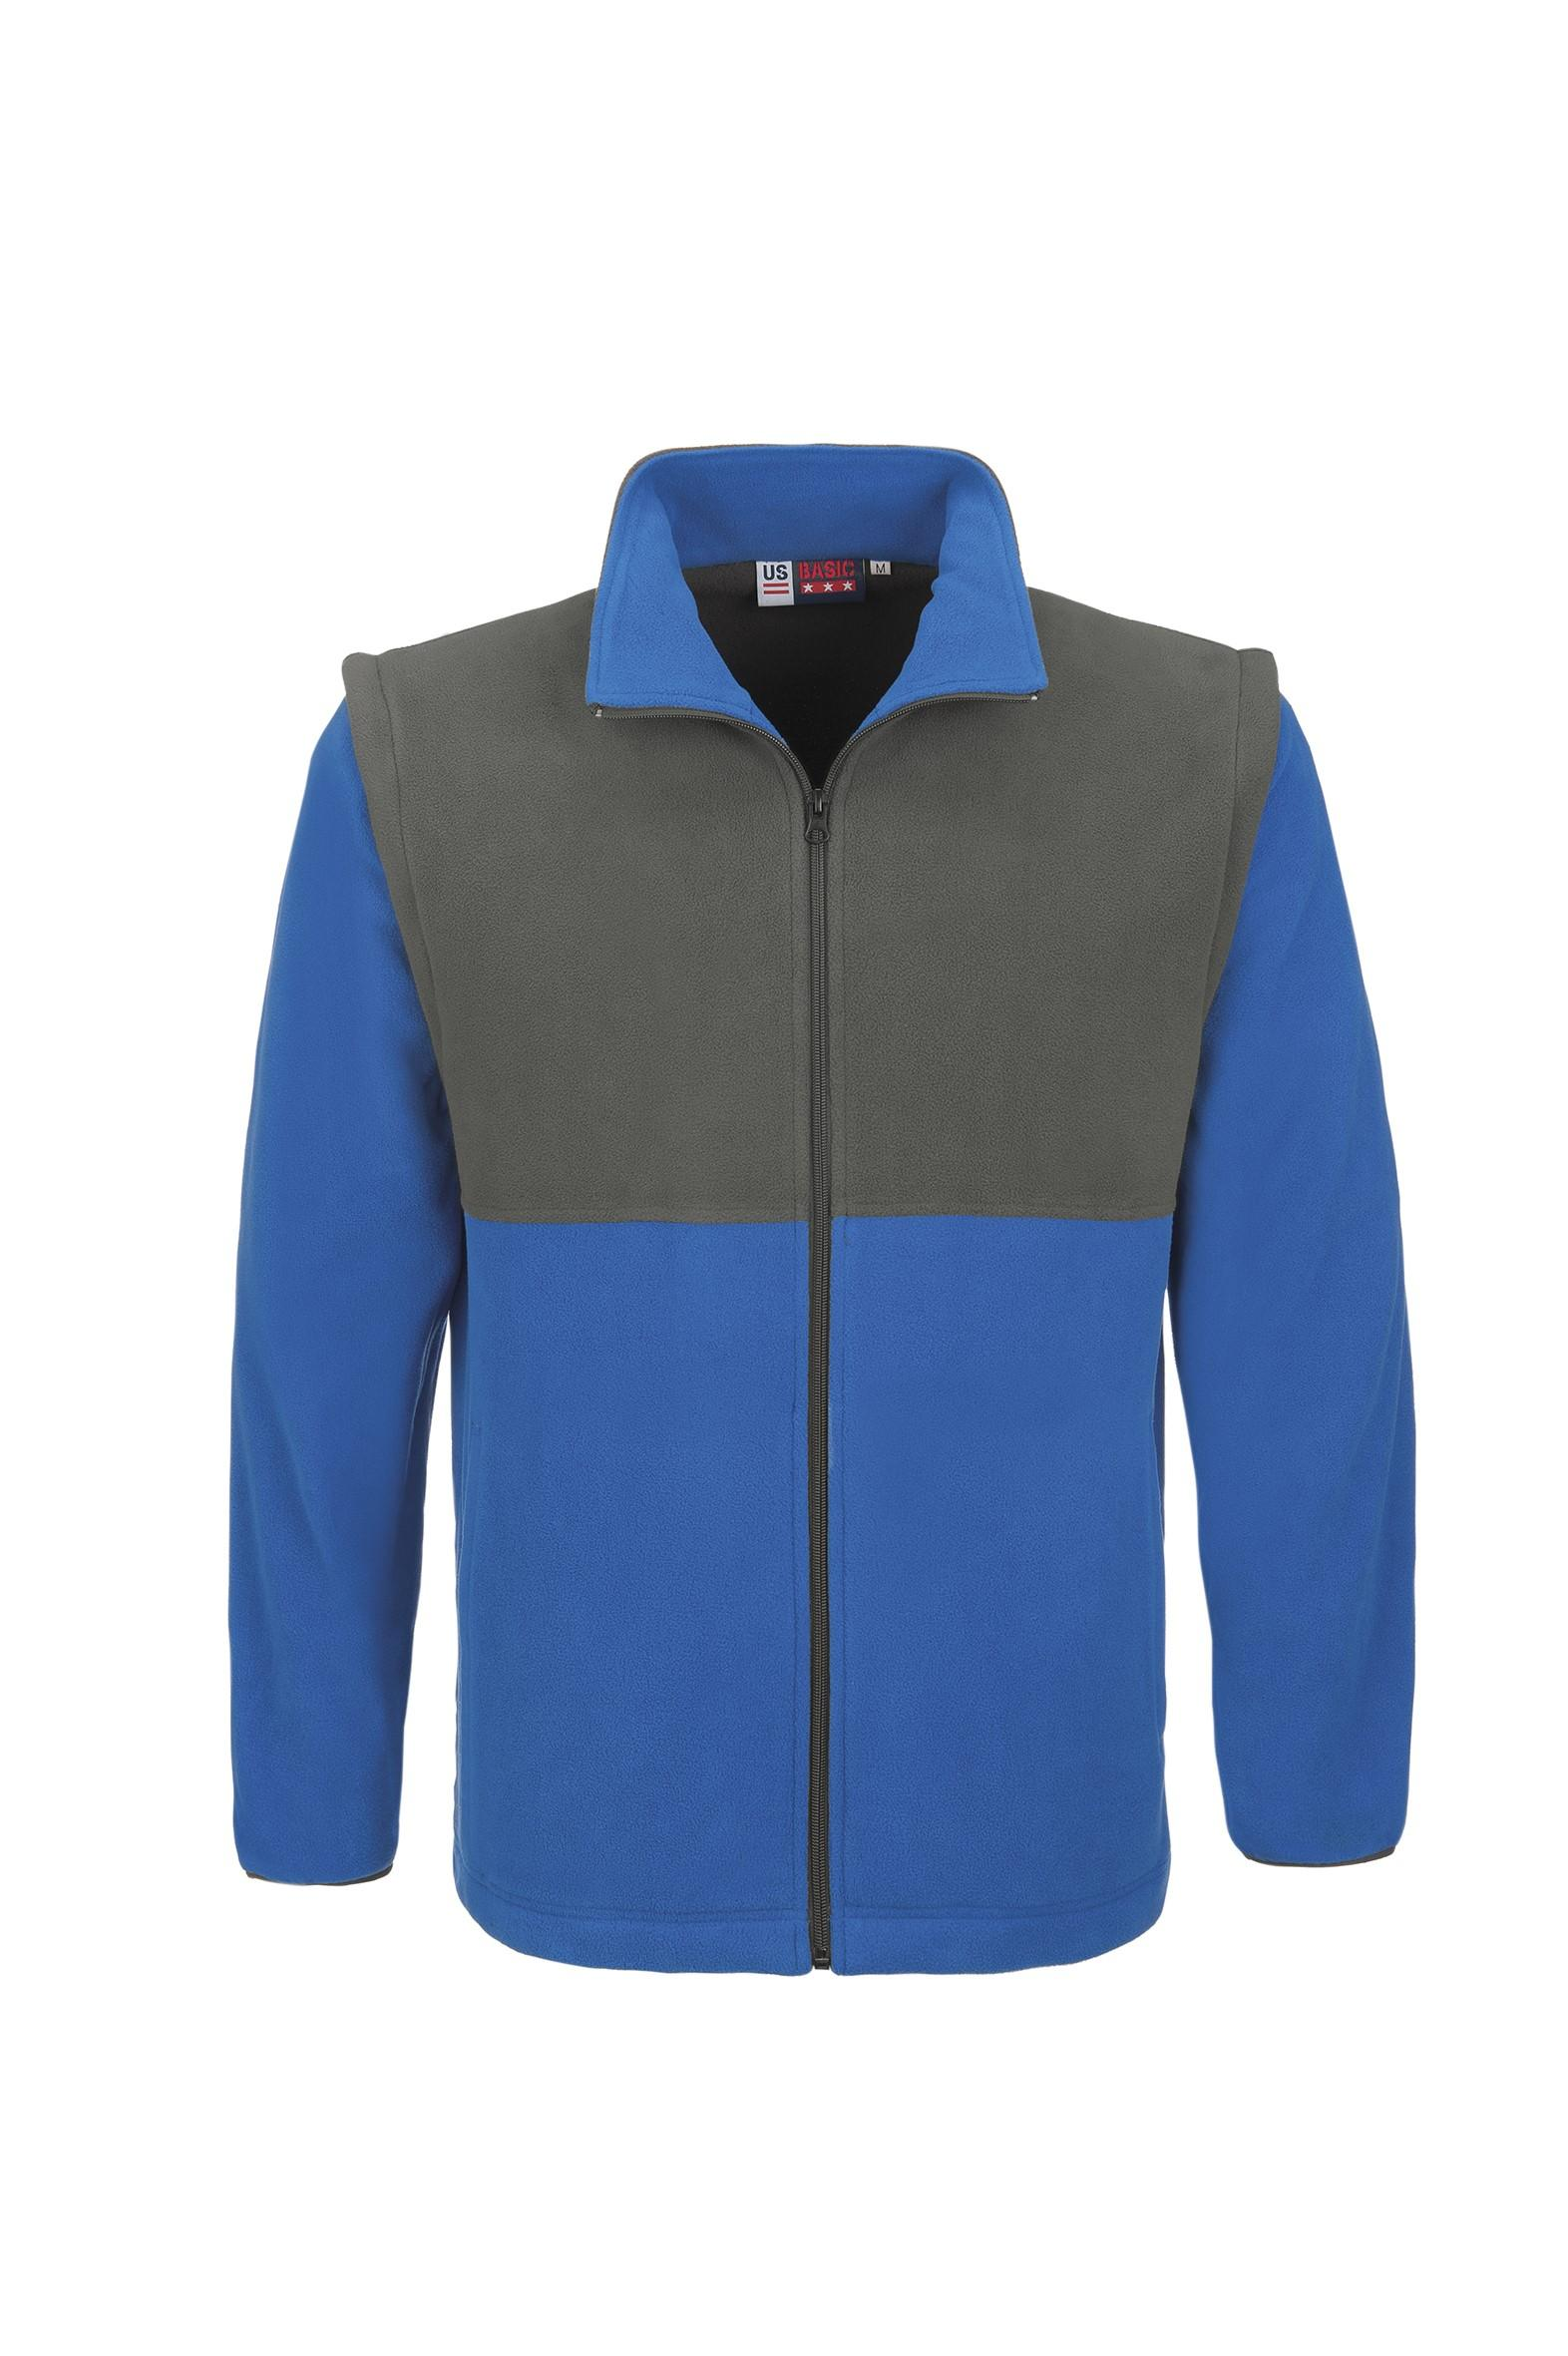 Mens Benneton Zip-off Micro Fleece Jacket - Blue Only